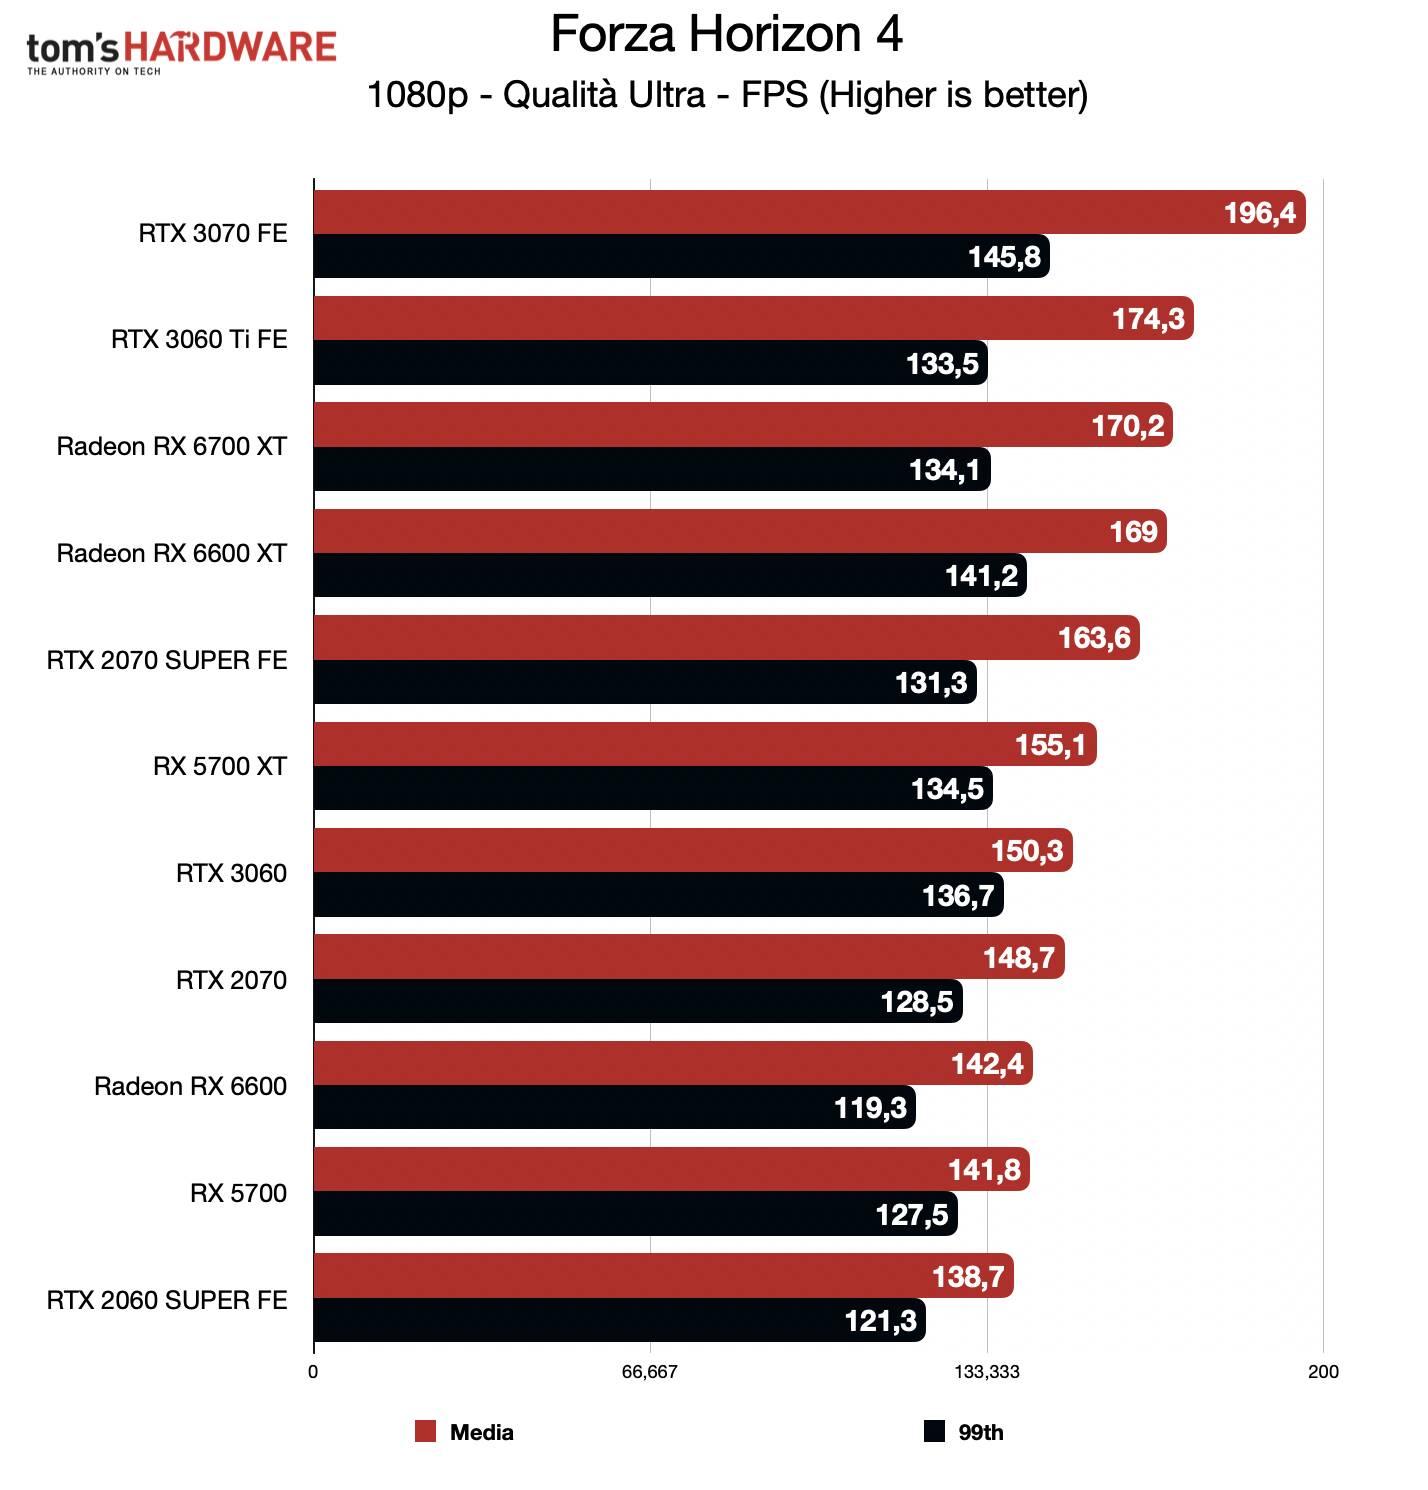 Benchmark Radeon RX 6600 - FHD - Forza Horizon 4